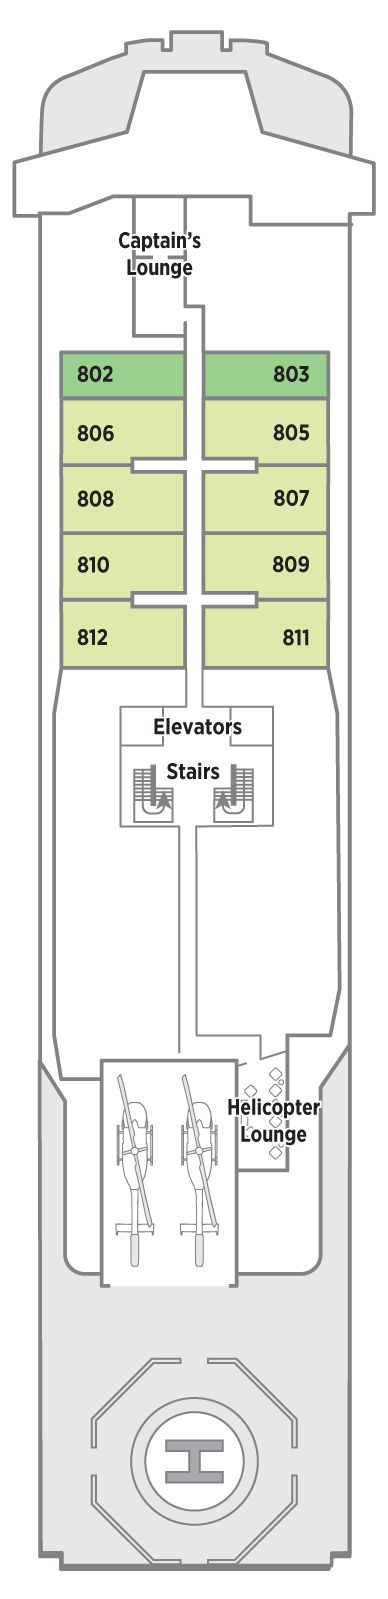 Penthouse Deck 8